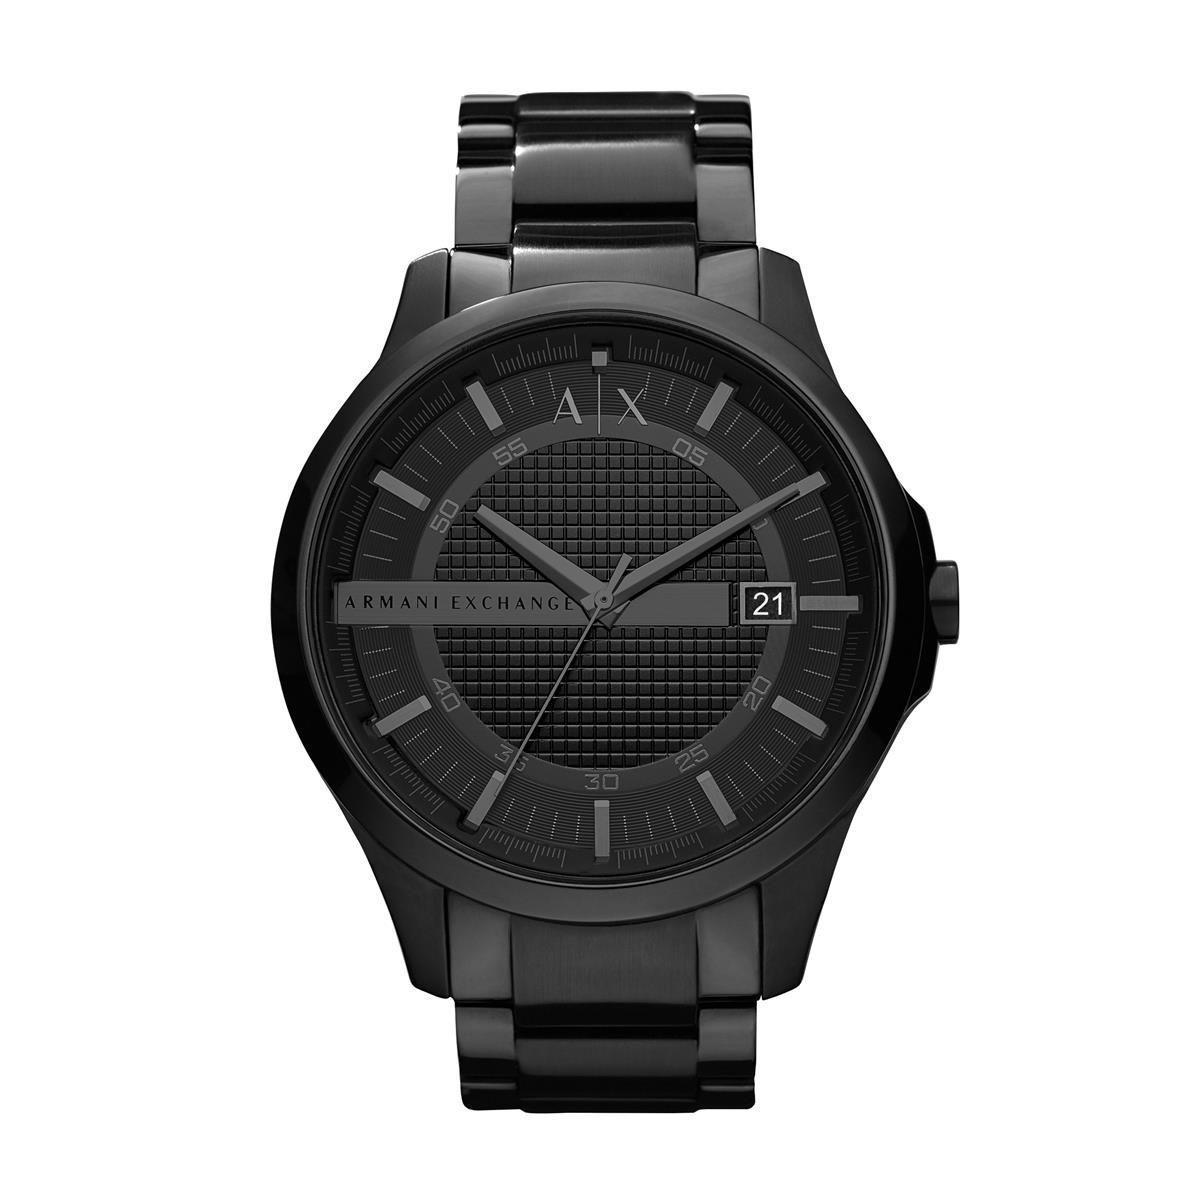 9c2bcec1d1d Reloj Armani Exchange AX2104 Hampton Hombre